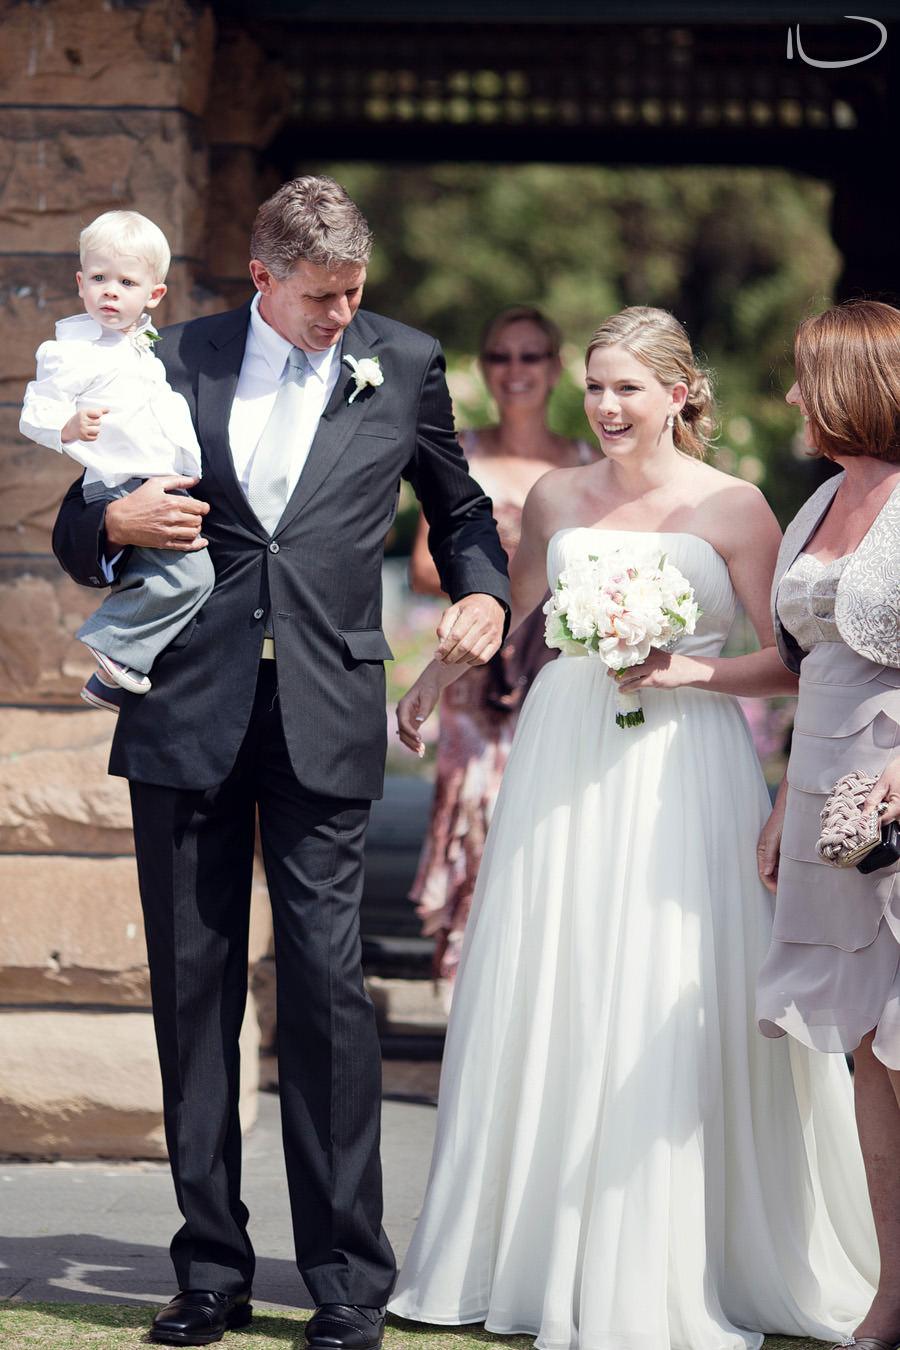 Botanic Gardens Wedding Photographer: Bride & parents walking down the aisle